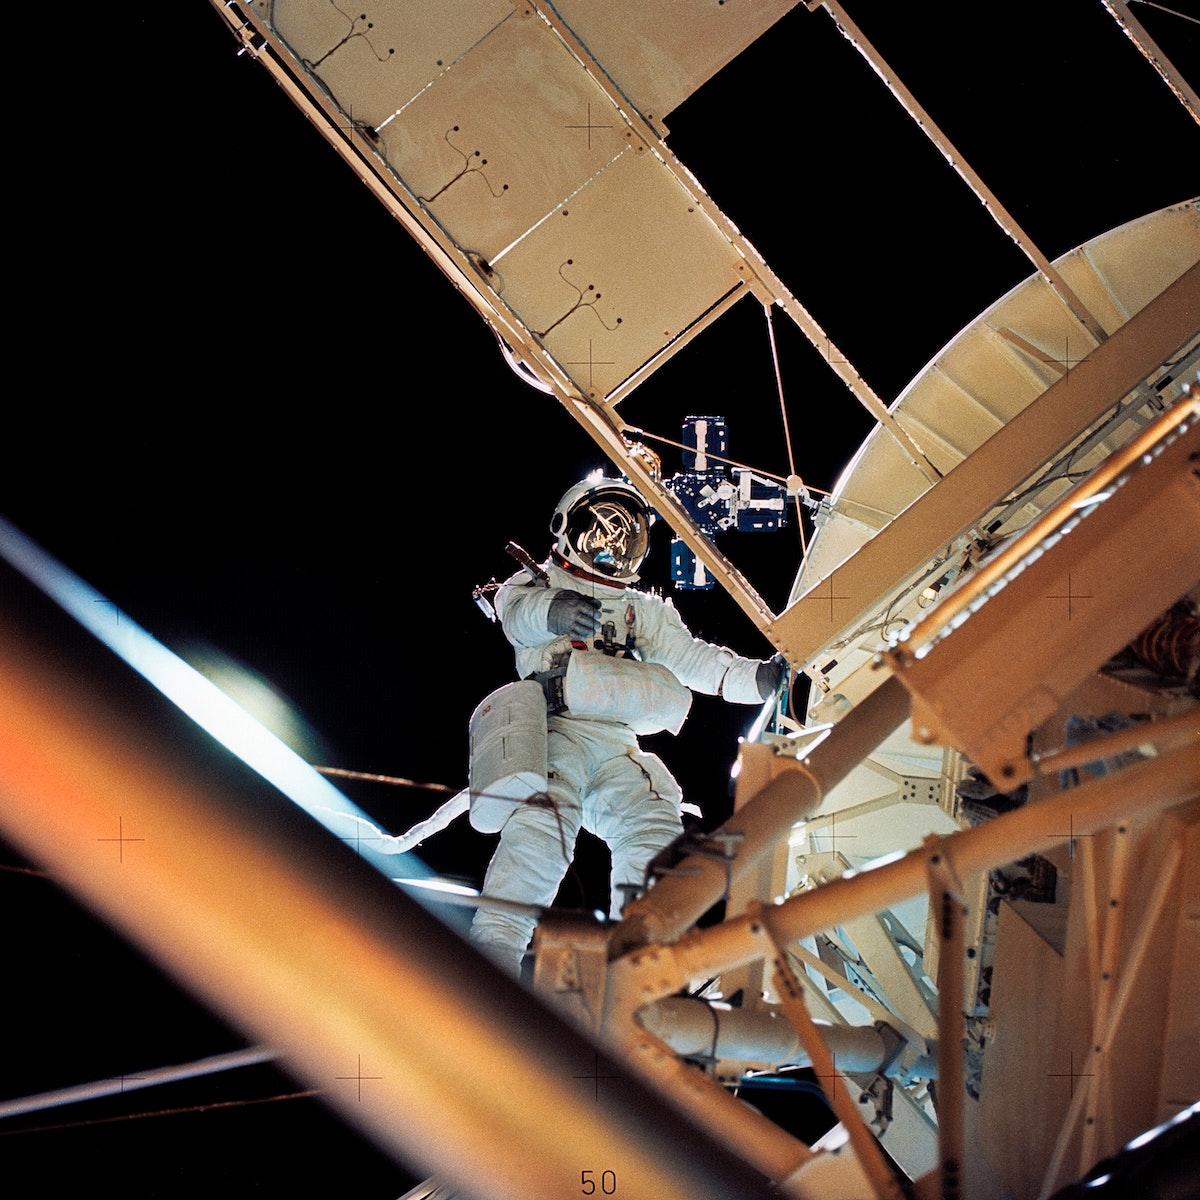 Astronaut Owen K. Garriott, Skylab 3 science pilot, retrieves an imagery experiment from the Apollo Telescope Mount (ATM)…